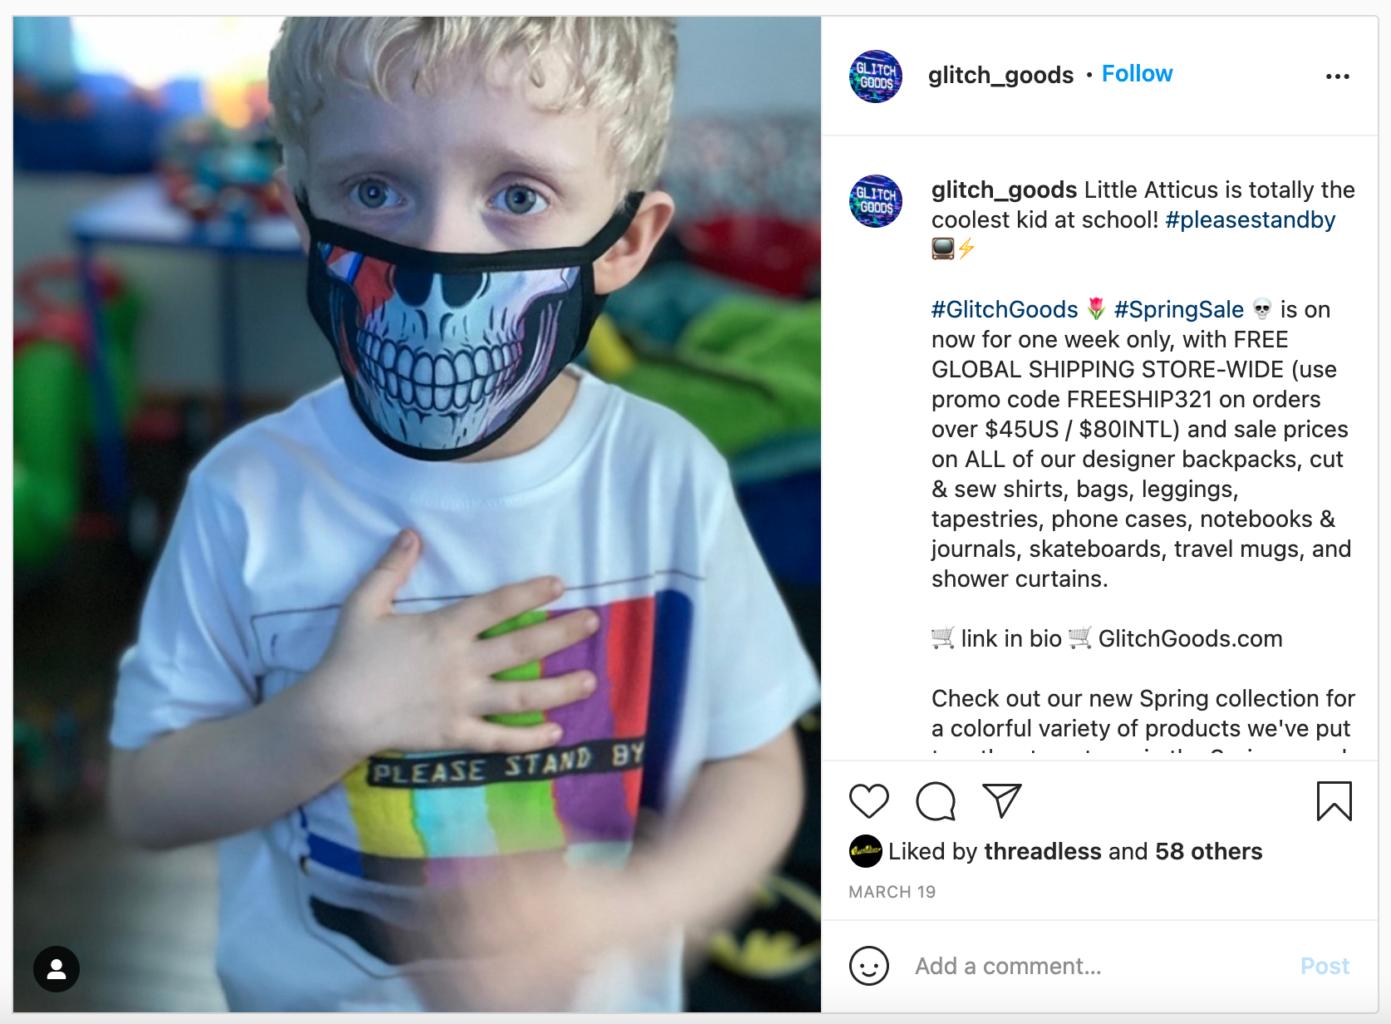 Glitch Goods by Rob Sheridan Instagram